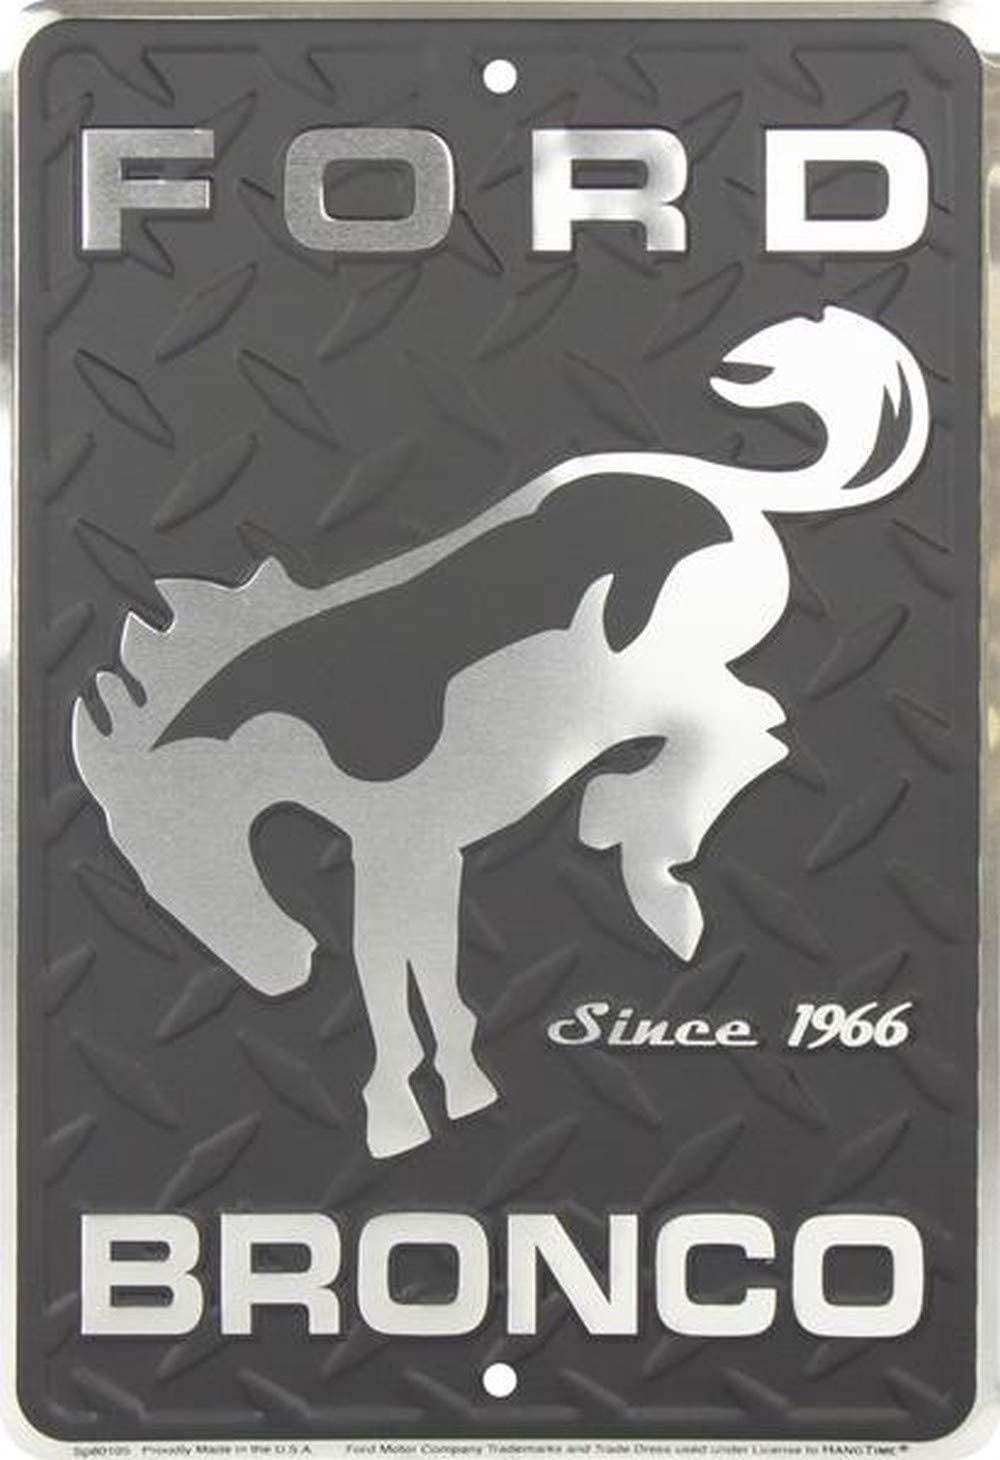 HangTime Ford Bronco Since 1966 8 x 12 inch Metal Sign